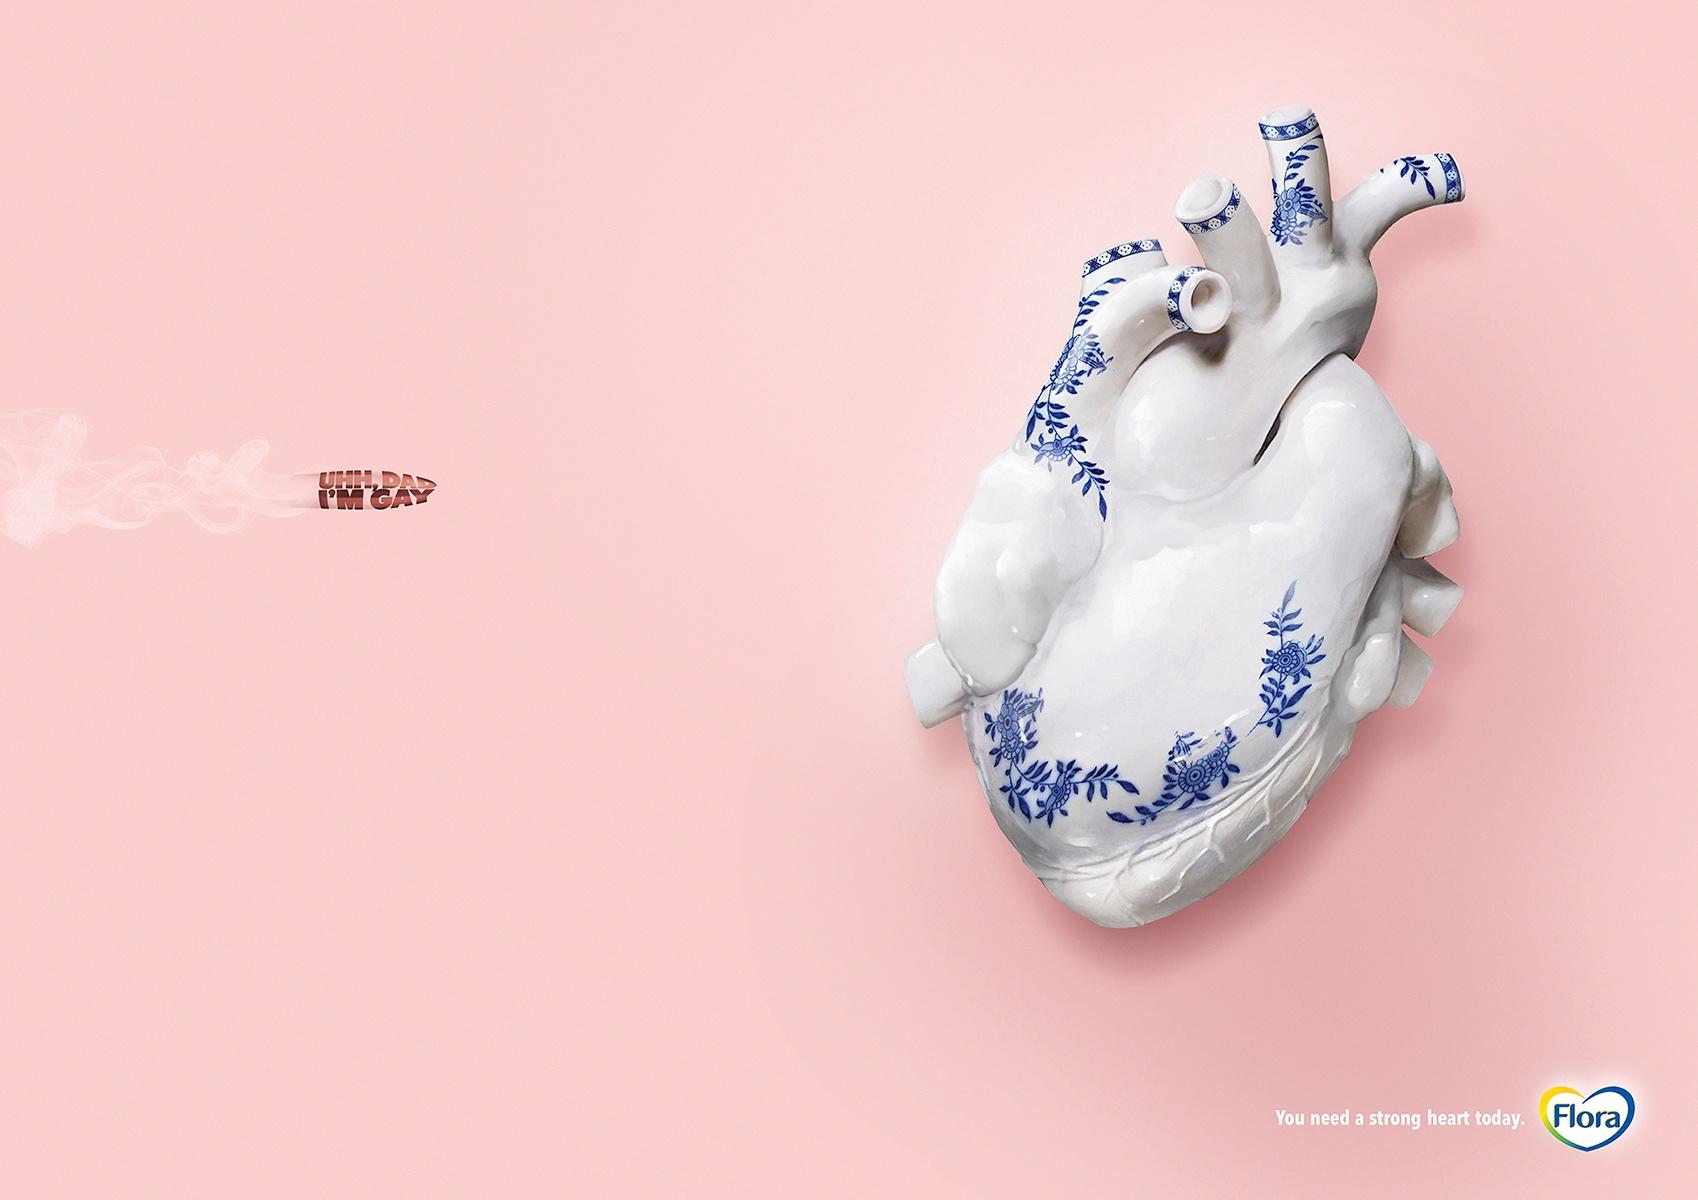 Flora-Margarine-Gay